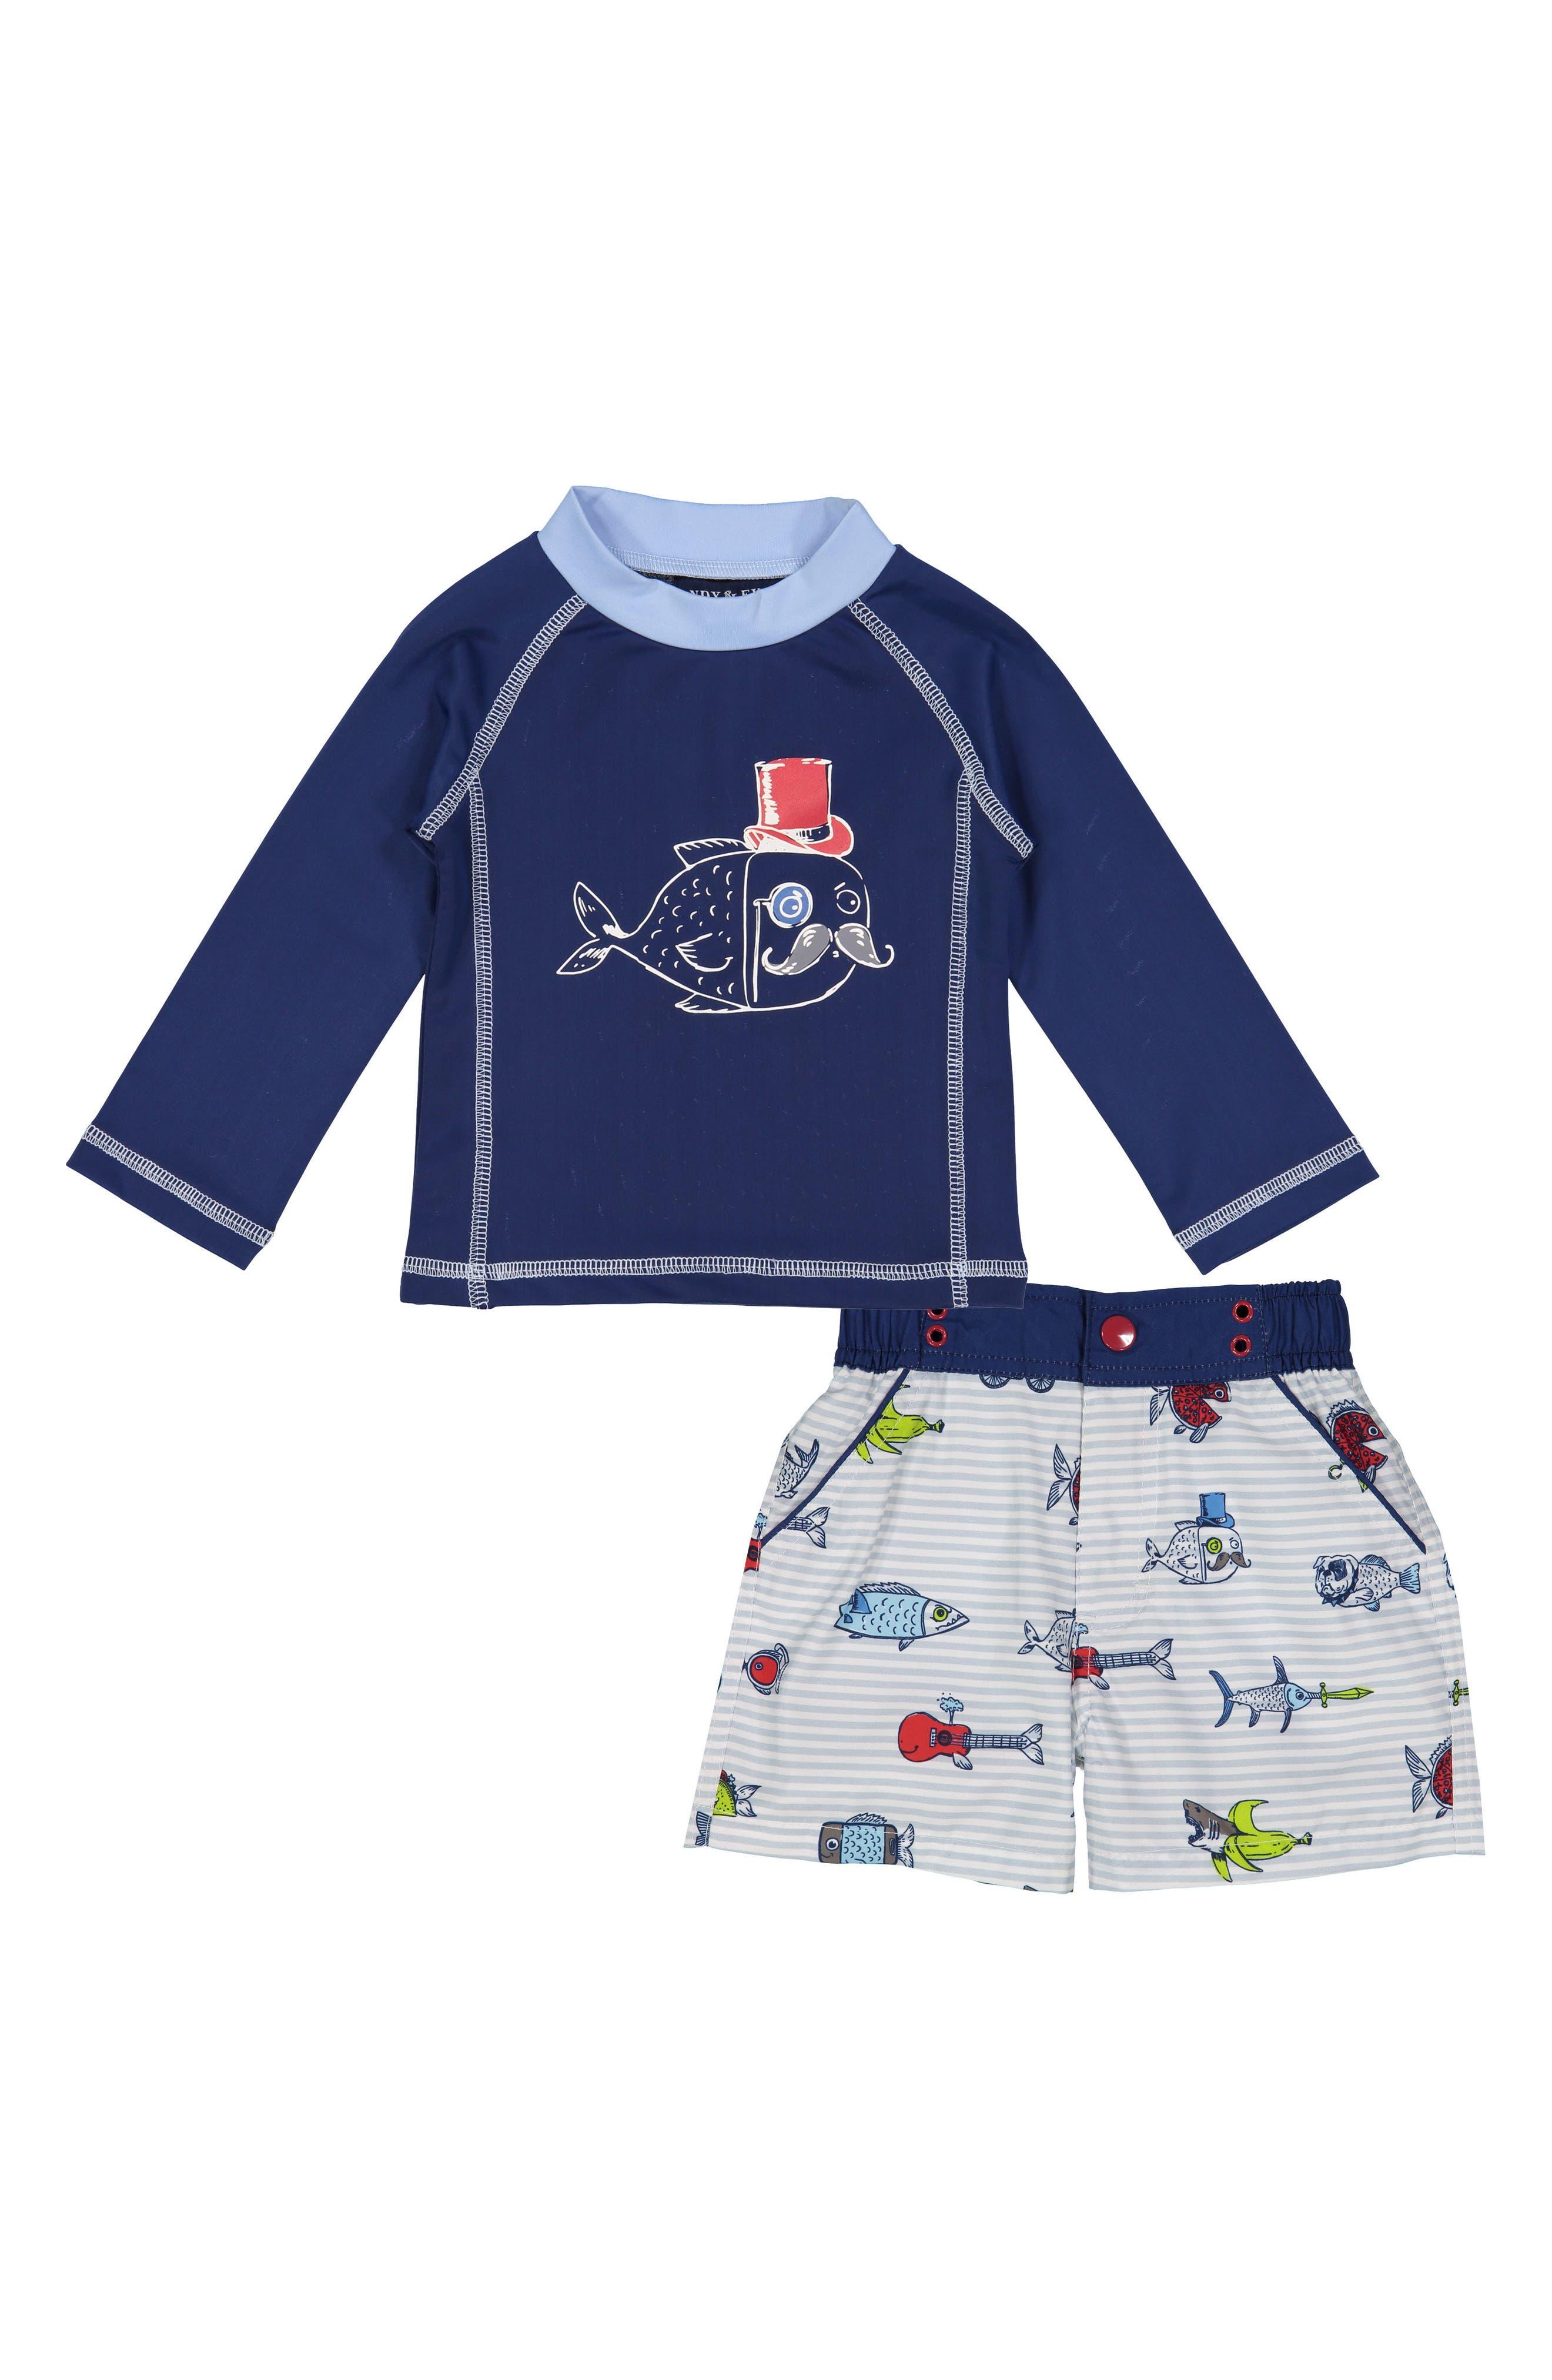 Alternate Image 1 Selected - Andy & Evan Fish Two-Piece Rashguard Swimsuit (Baby Boys)